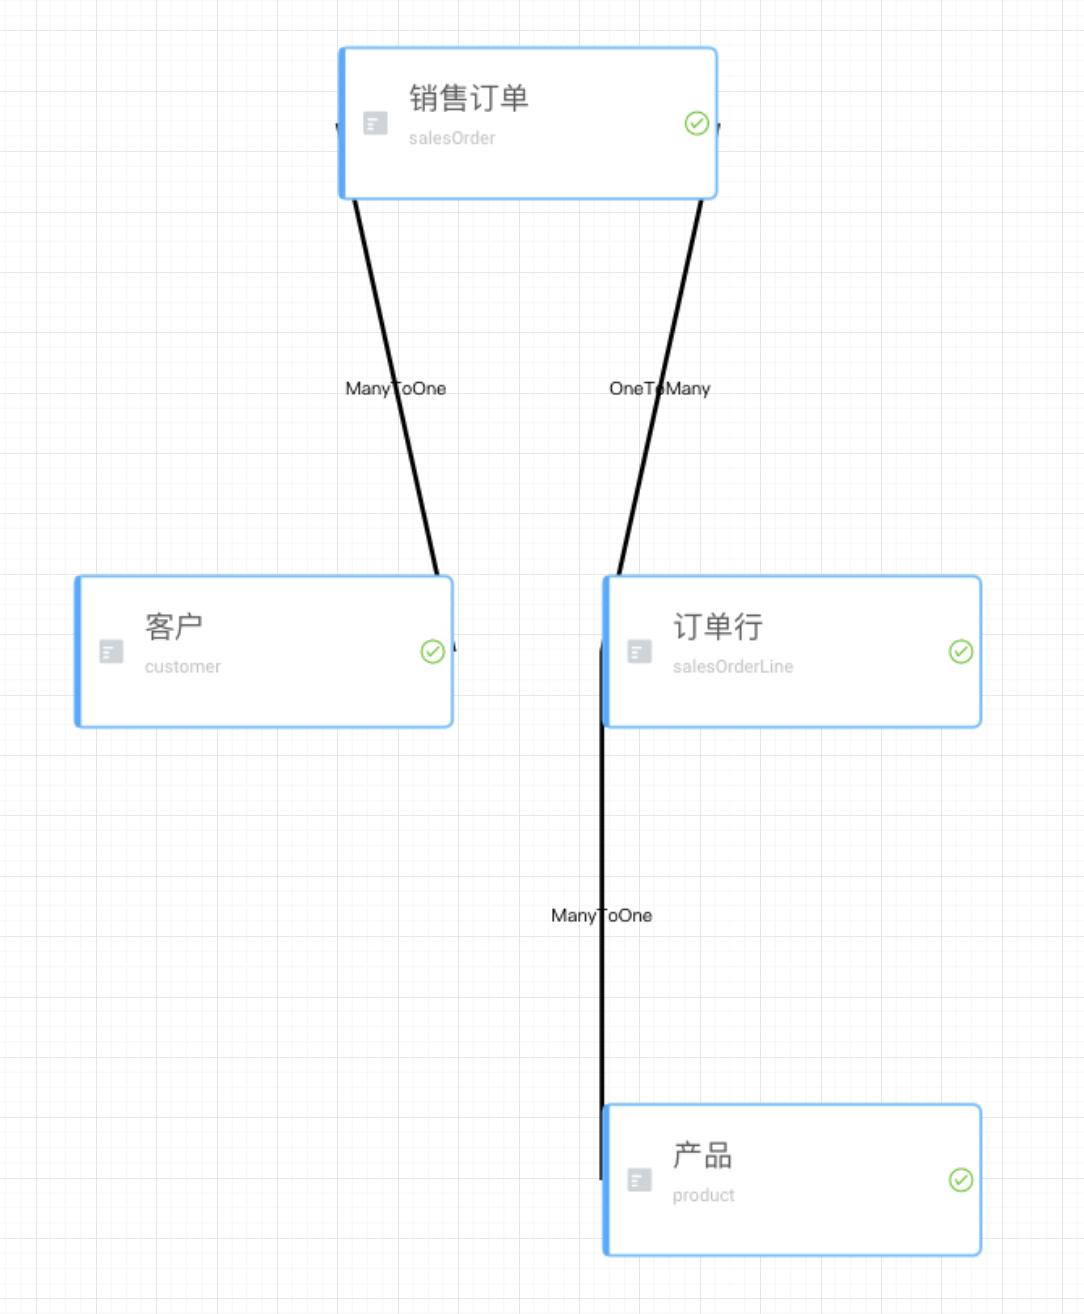 relationGraph